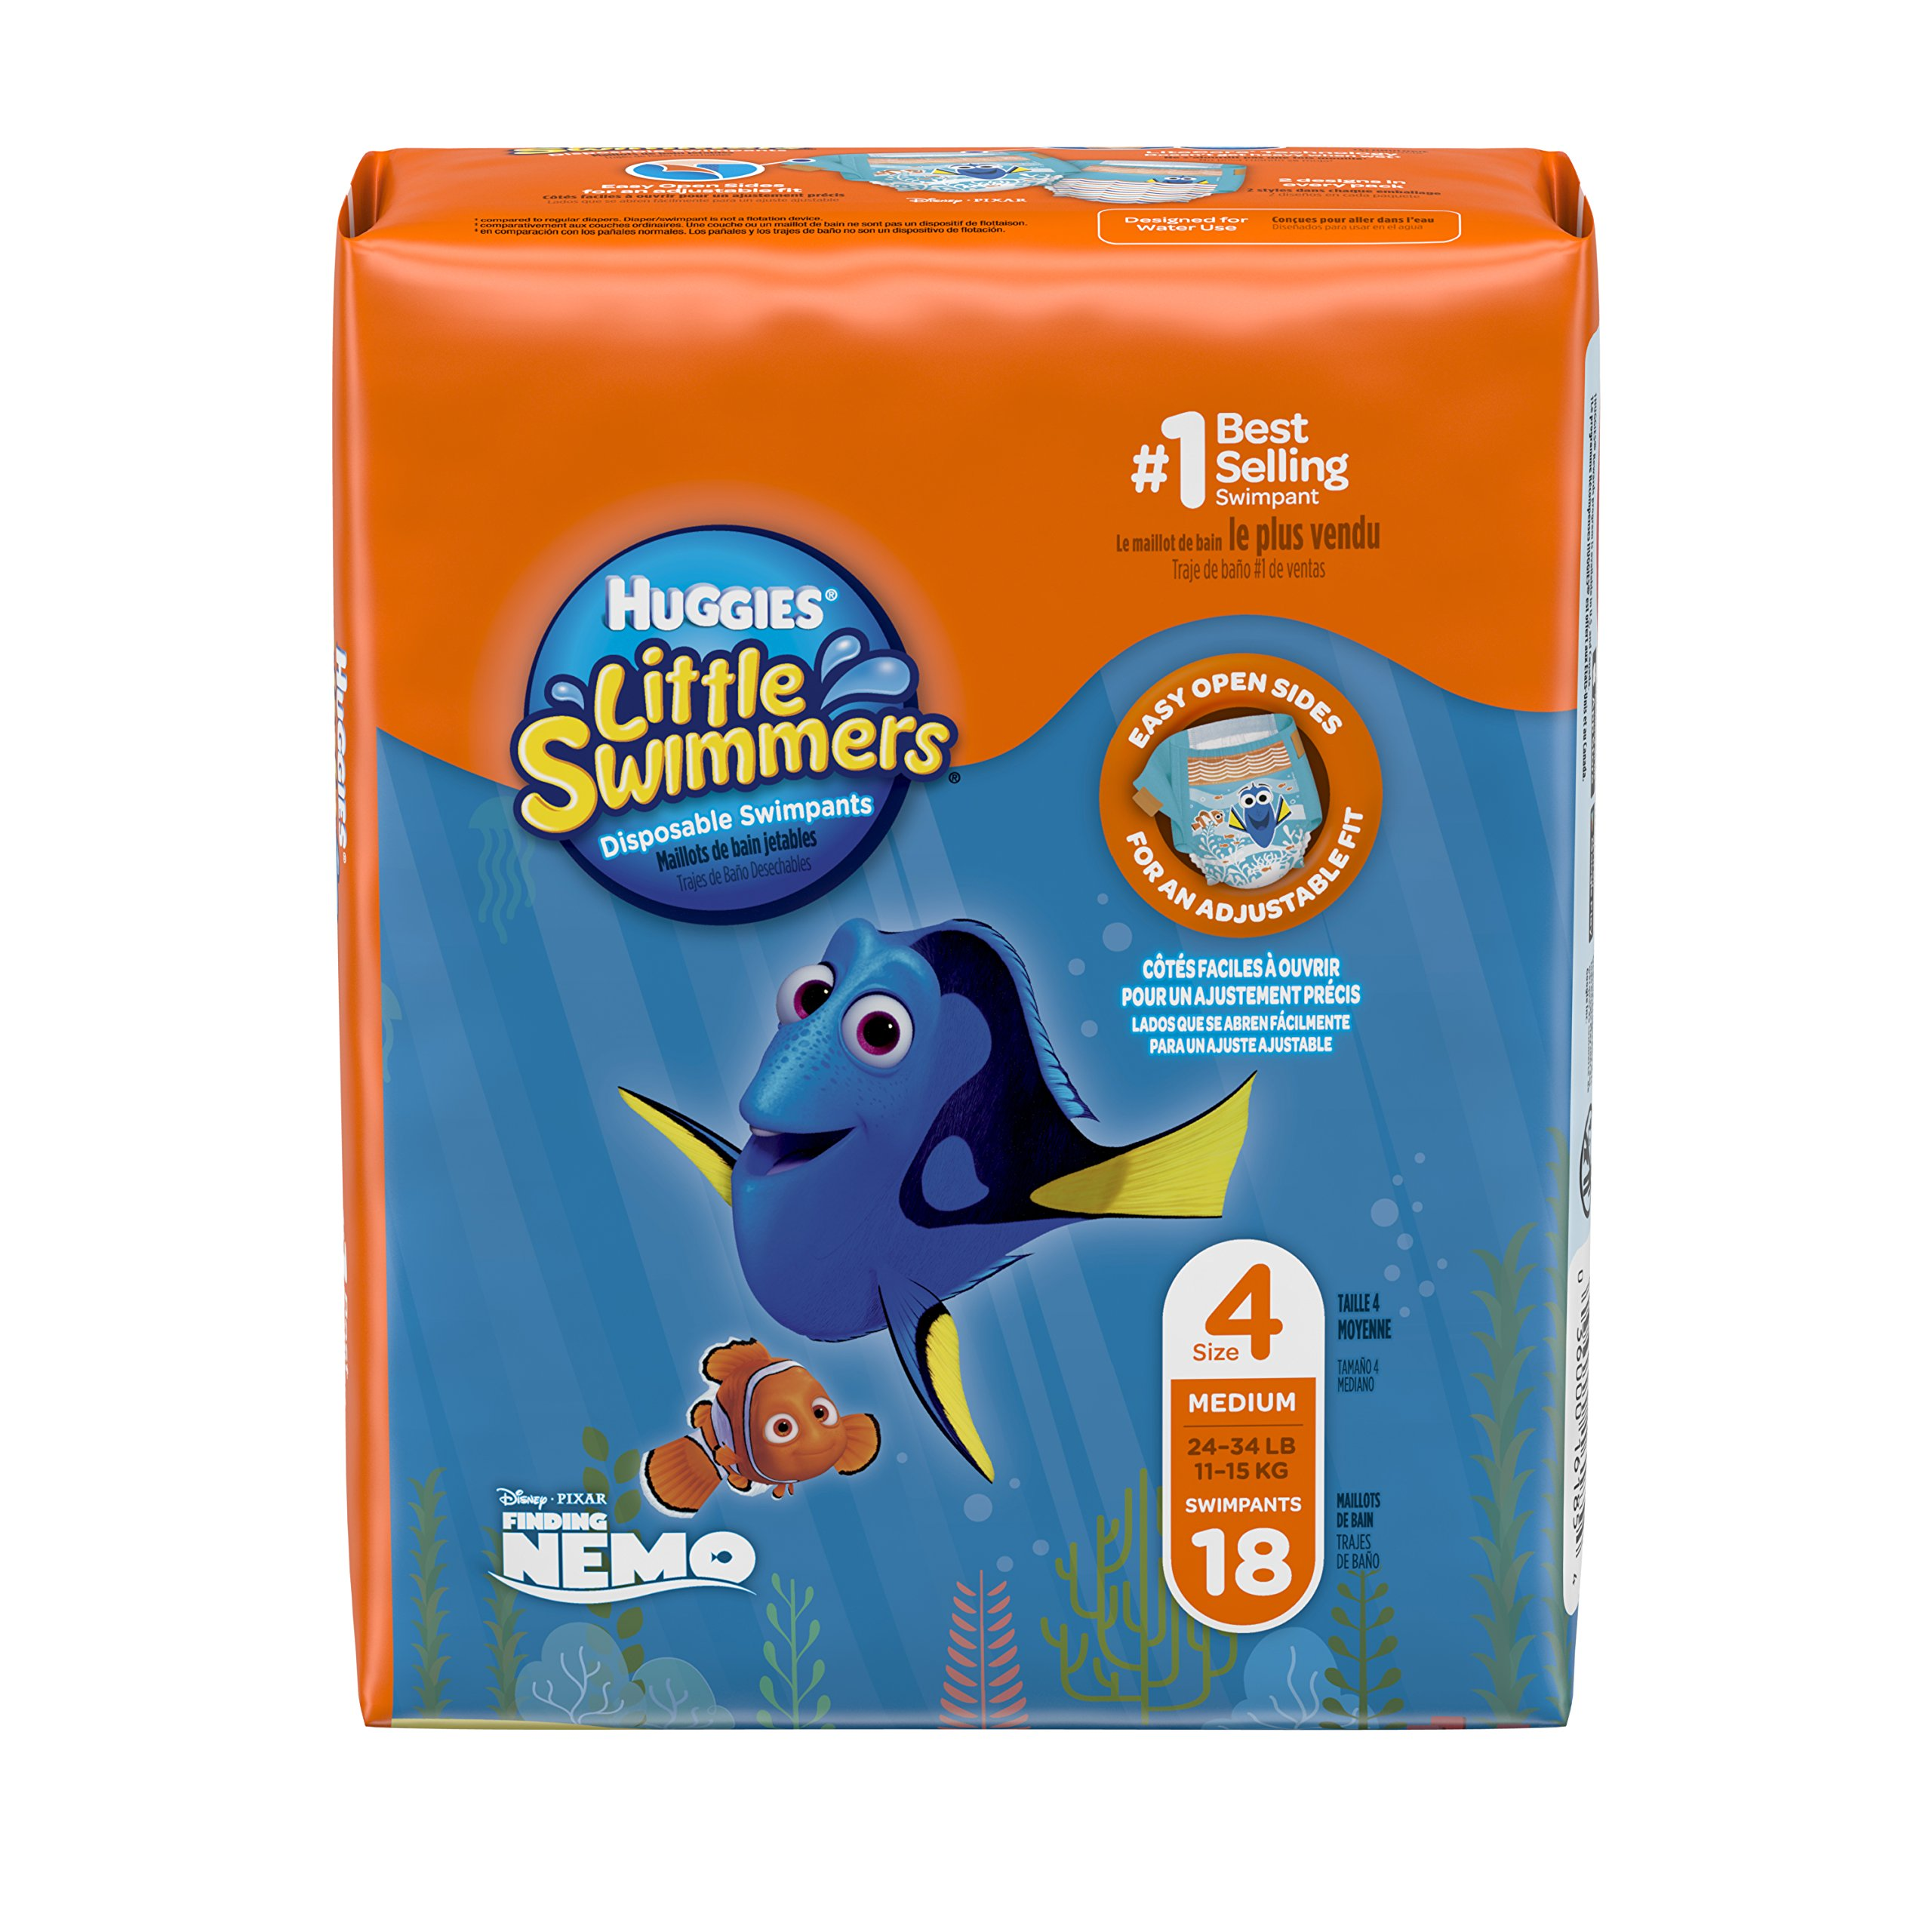 Huggies Little Swimmers Disposable Swim Diapers, Swimpants, Size 4 Medium (24-34